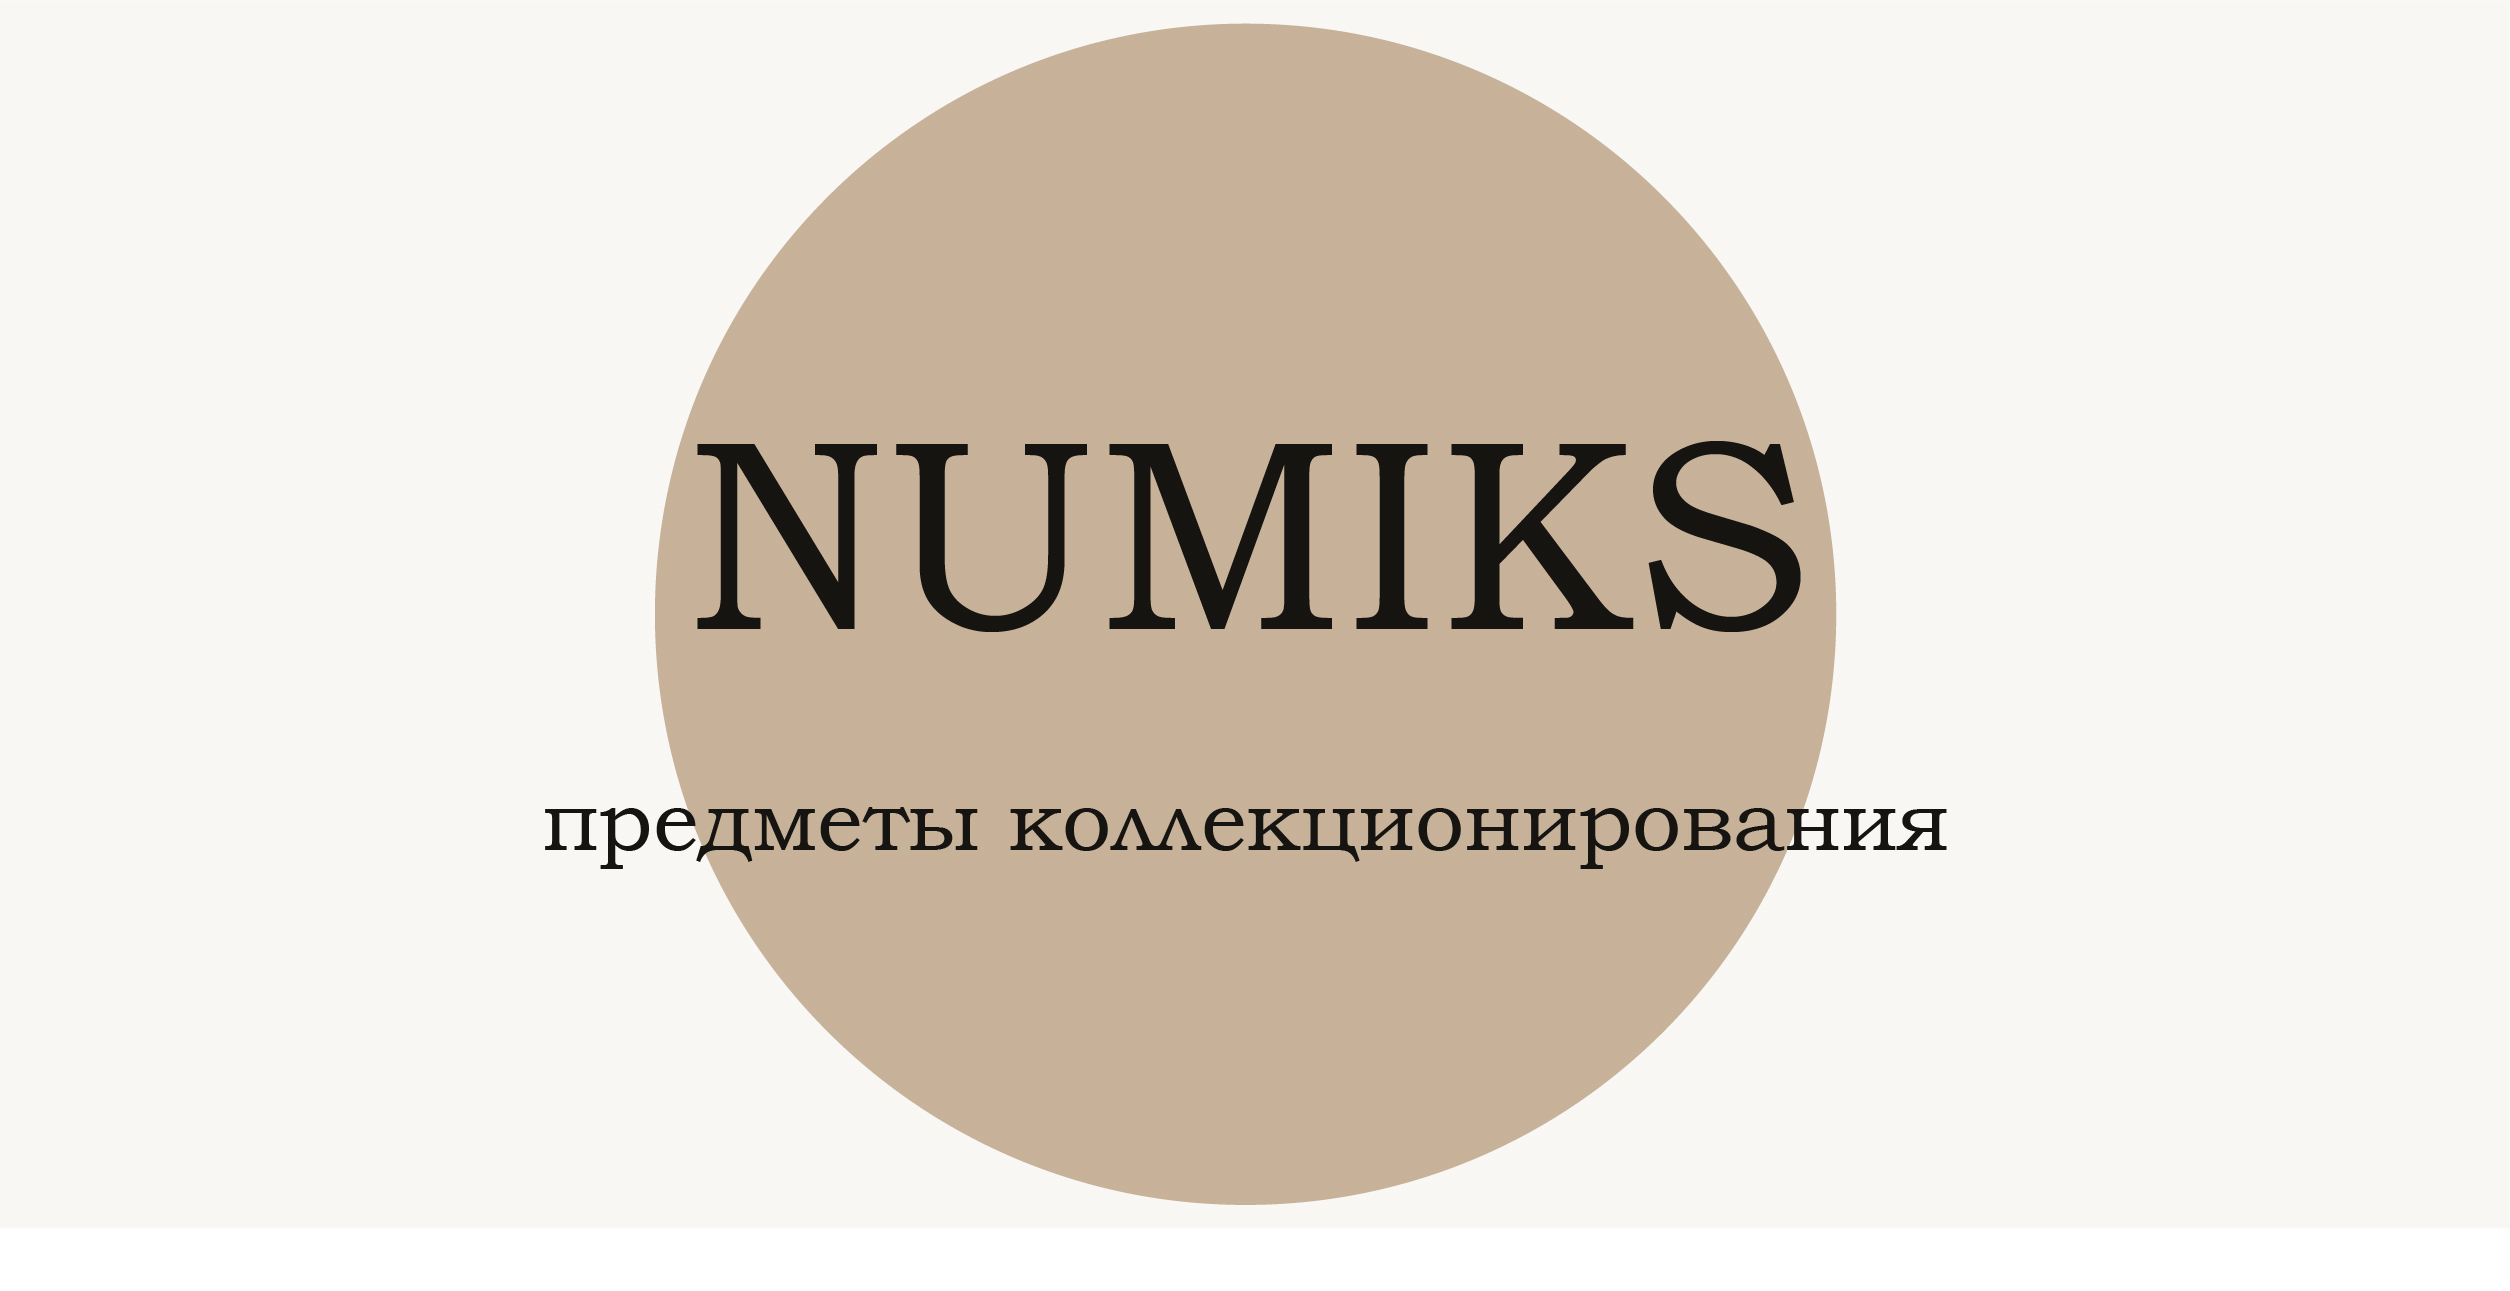 Логотип для интернет-магазина фото f_4755ec66b7c312f7.jpg